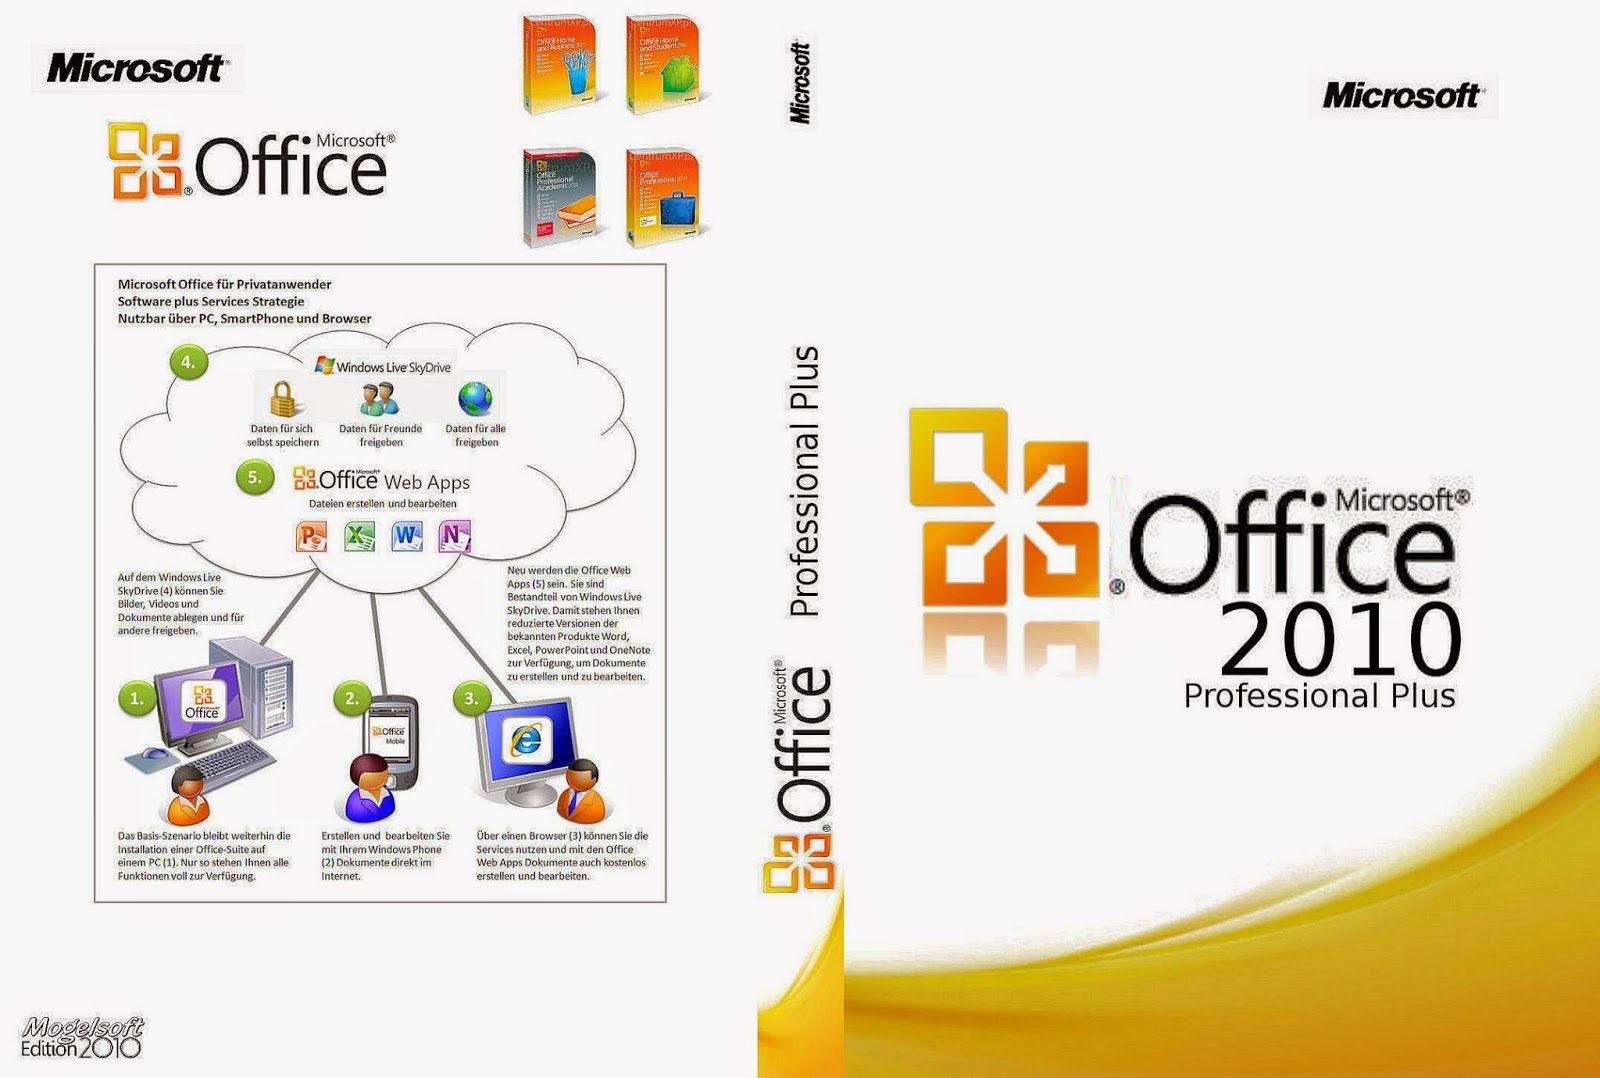 office 2010 professional plus download 32 bit